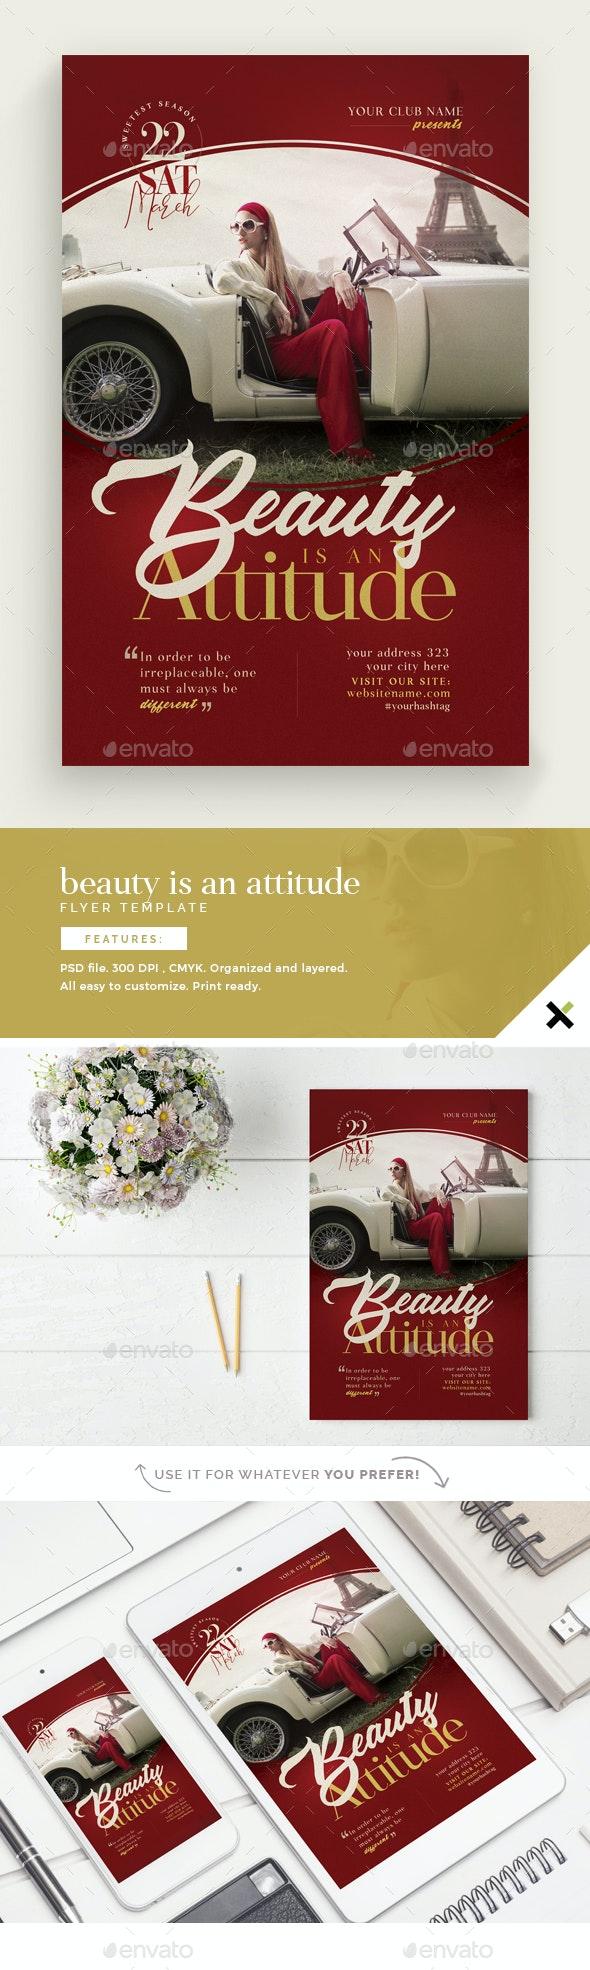 Beauty Is An Attitude Flyer Template - Flyers Print Templates